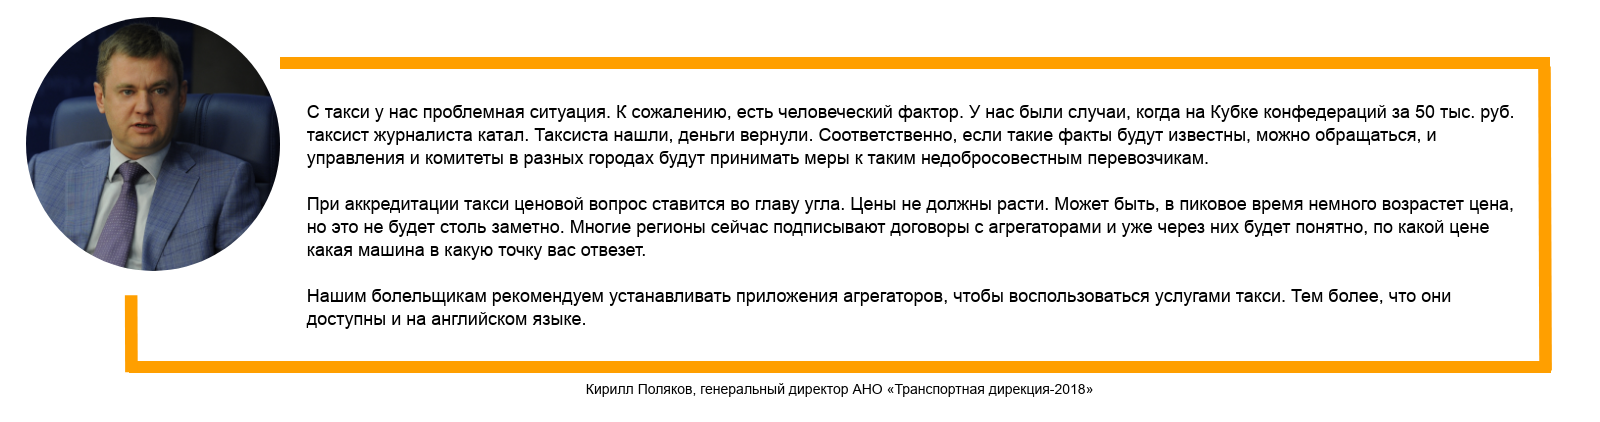 Кирилл Поляков про такси